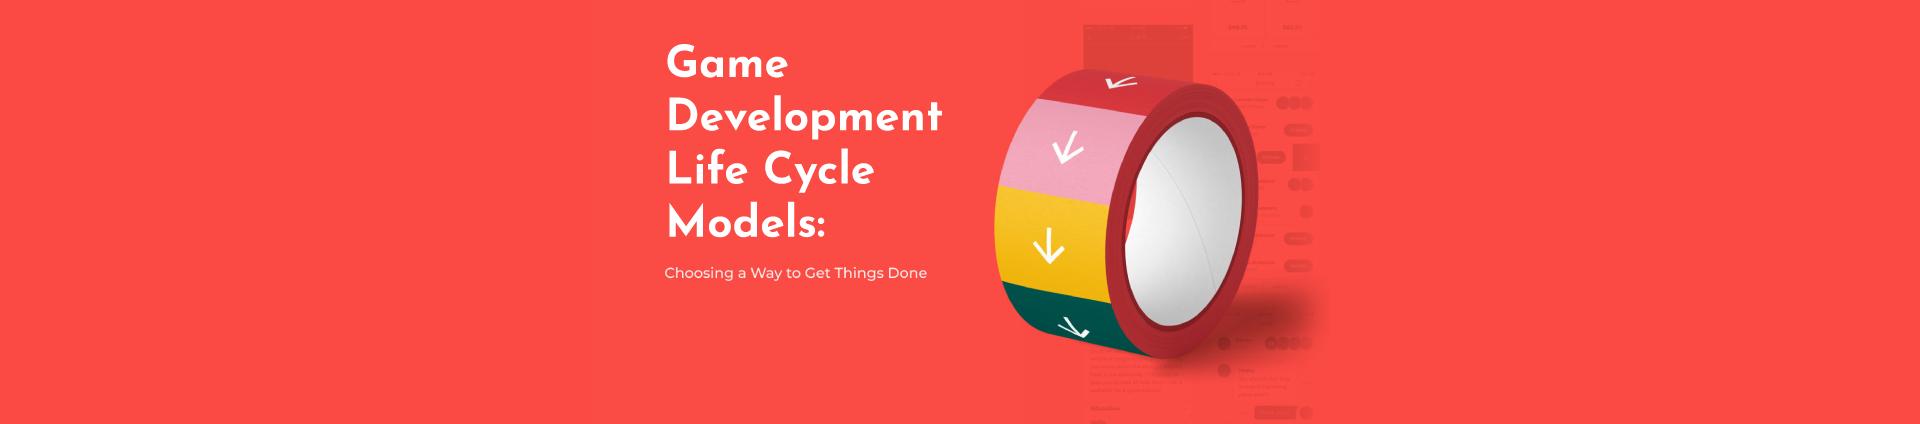 Game Development Models